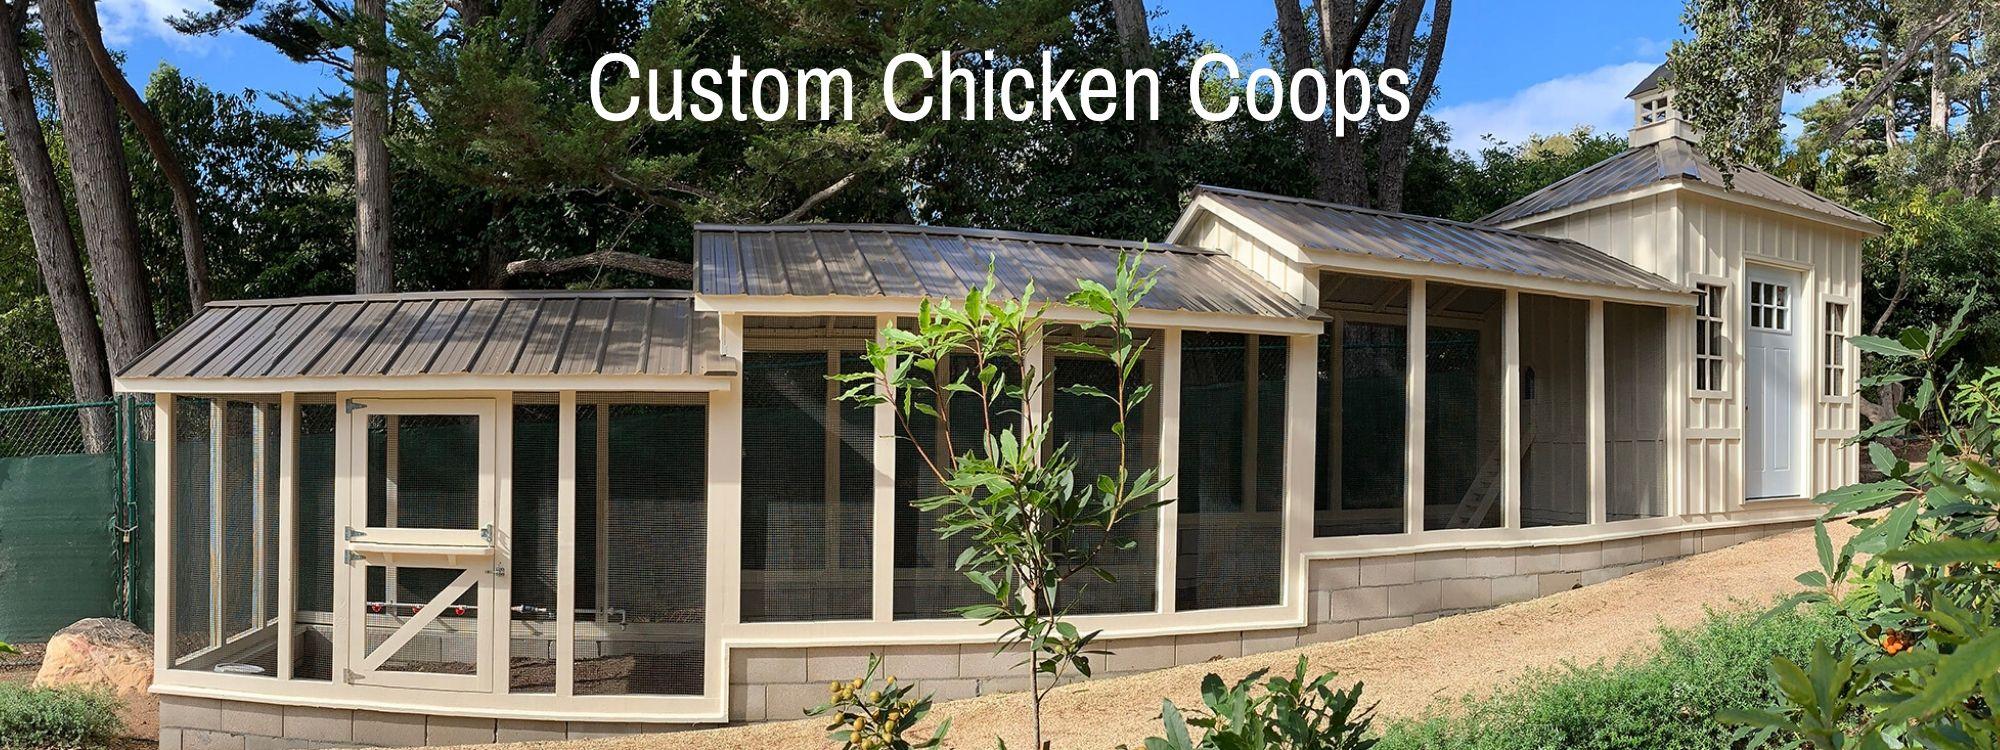 Carolina Coops Custom Chicken Coops